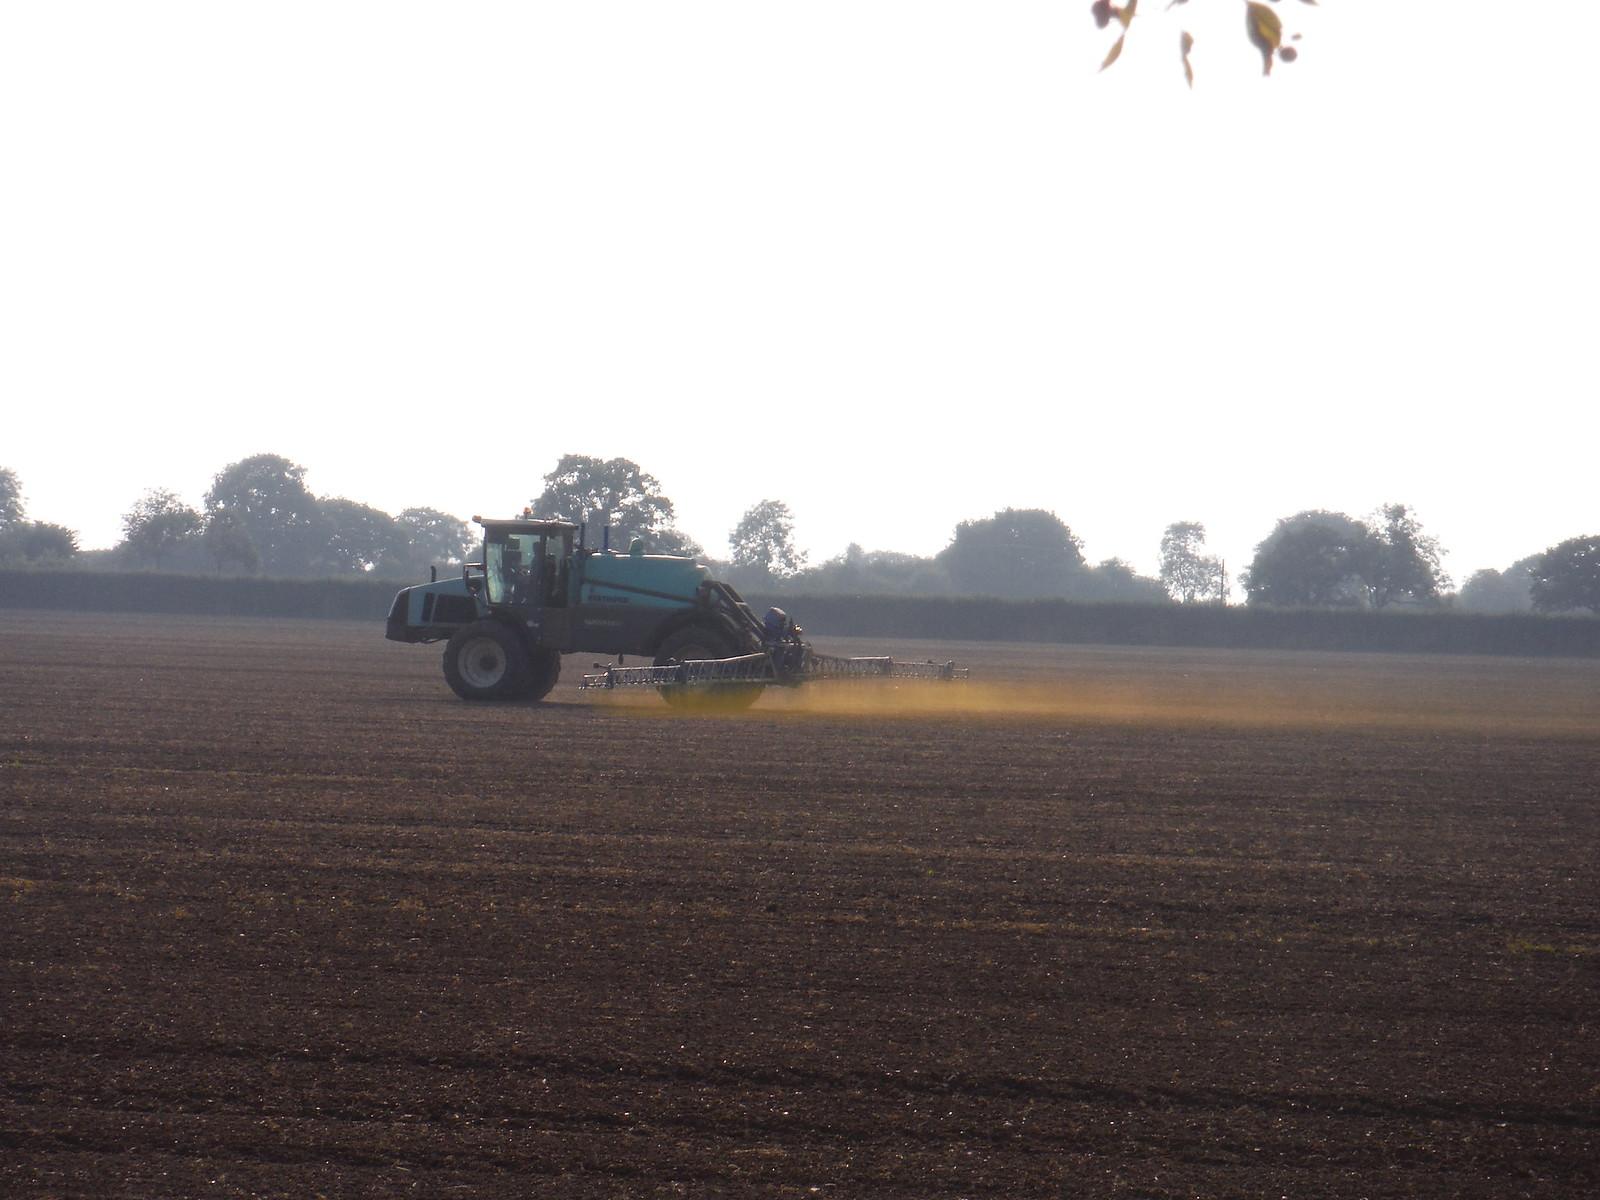 Farmer spraying some green stuff SWC Walk 159 South Woodham Ferrers to North Fambridge